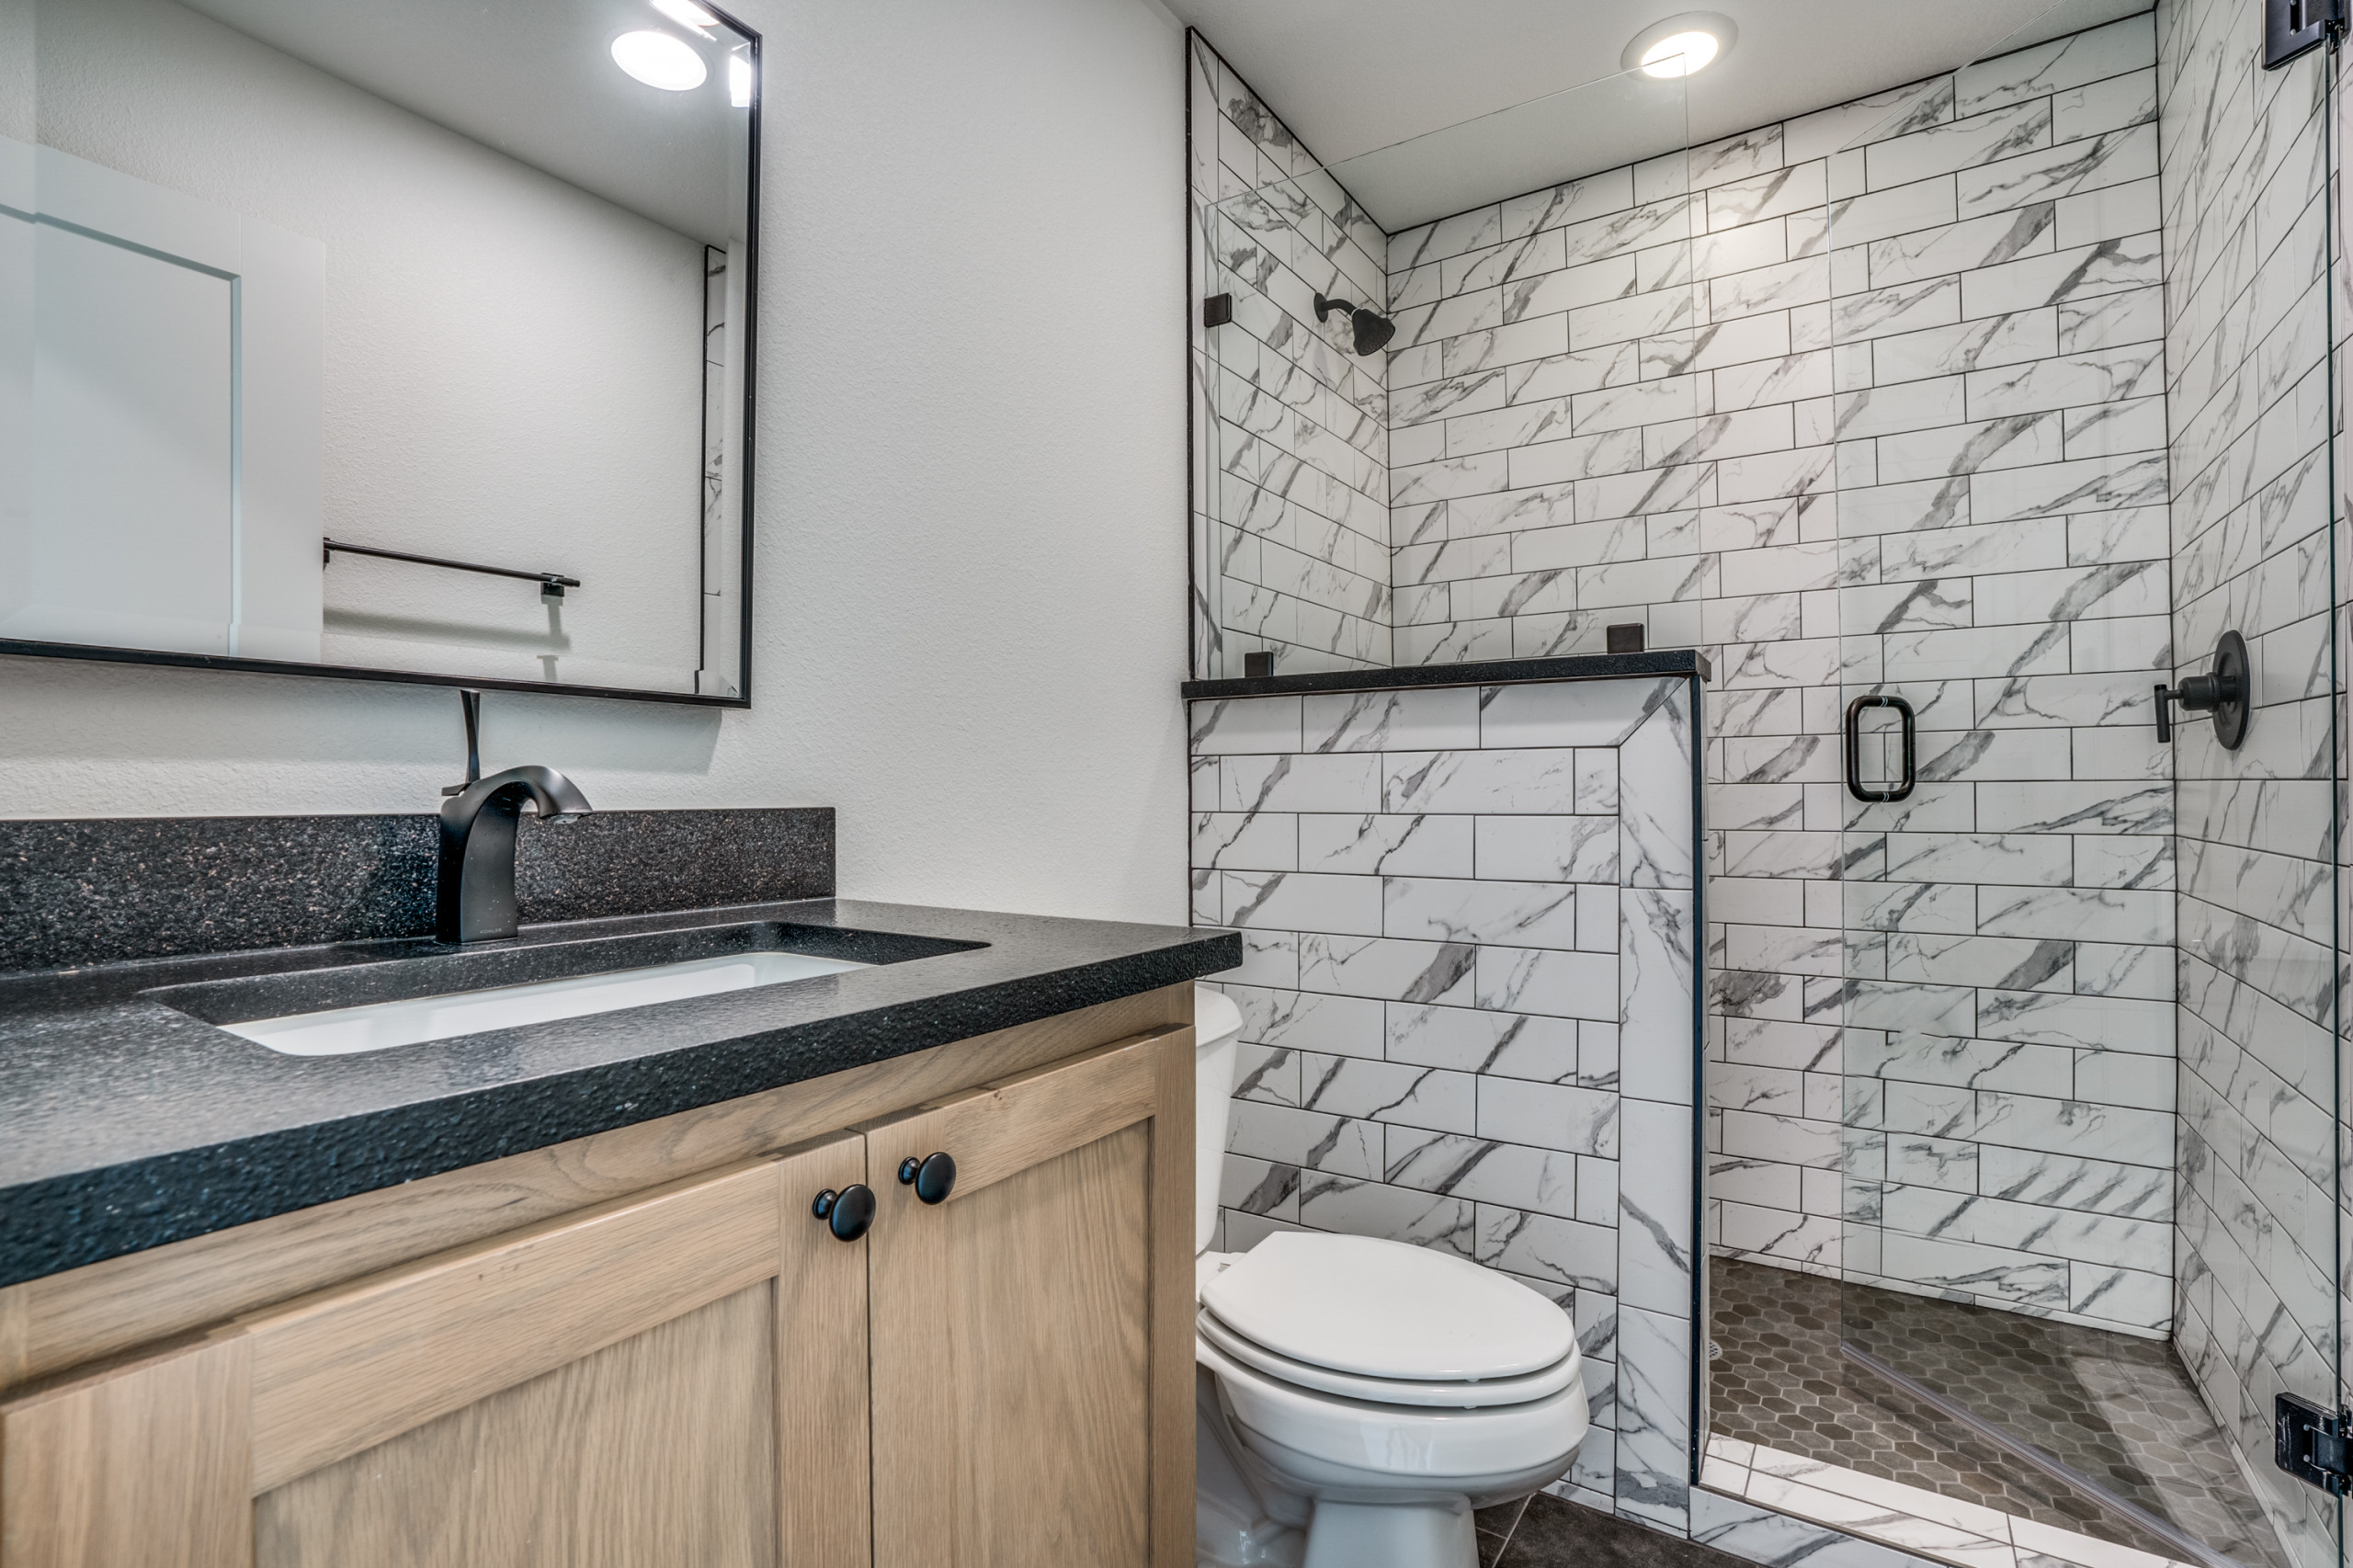 Bathroom Tile - Black & White w/ Wood Accents